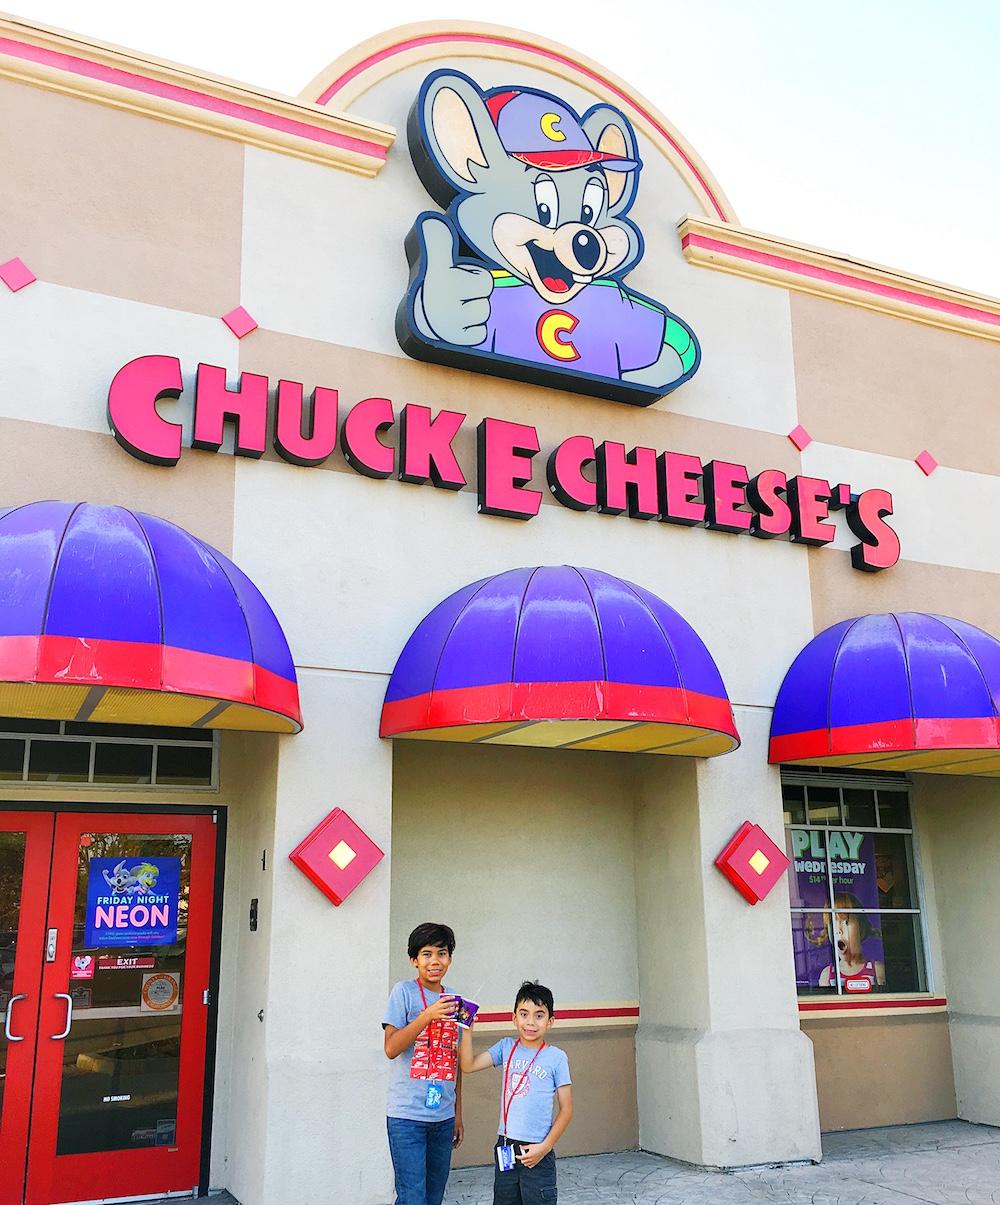 Best Chuck E. Cheese's experience - LivingMiVidaLoca.com